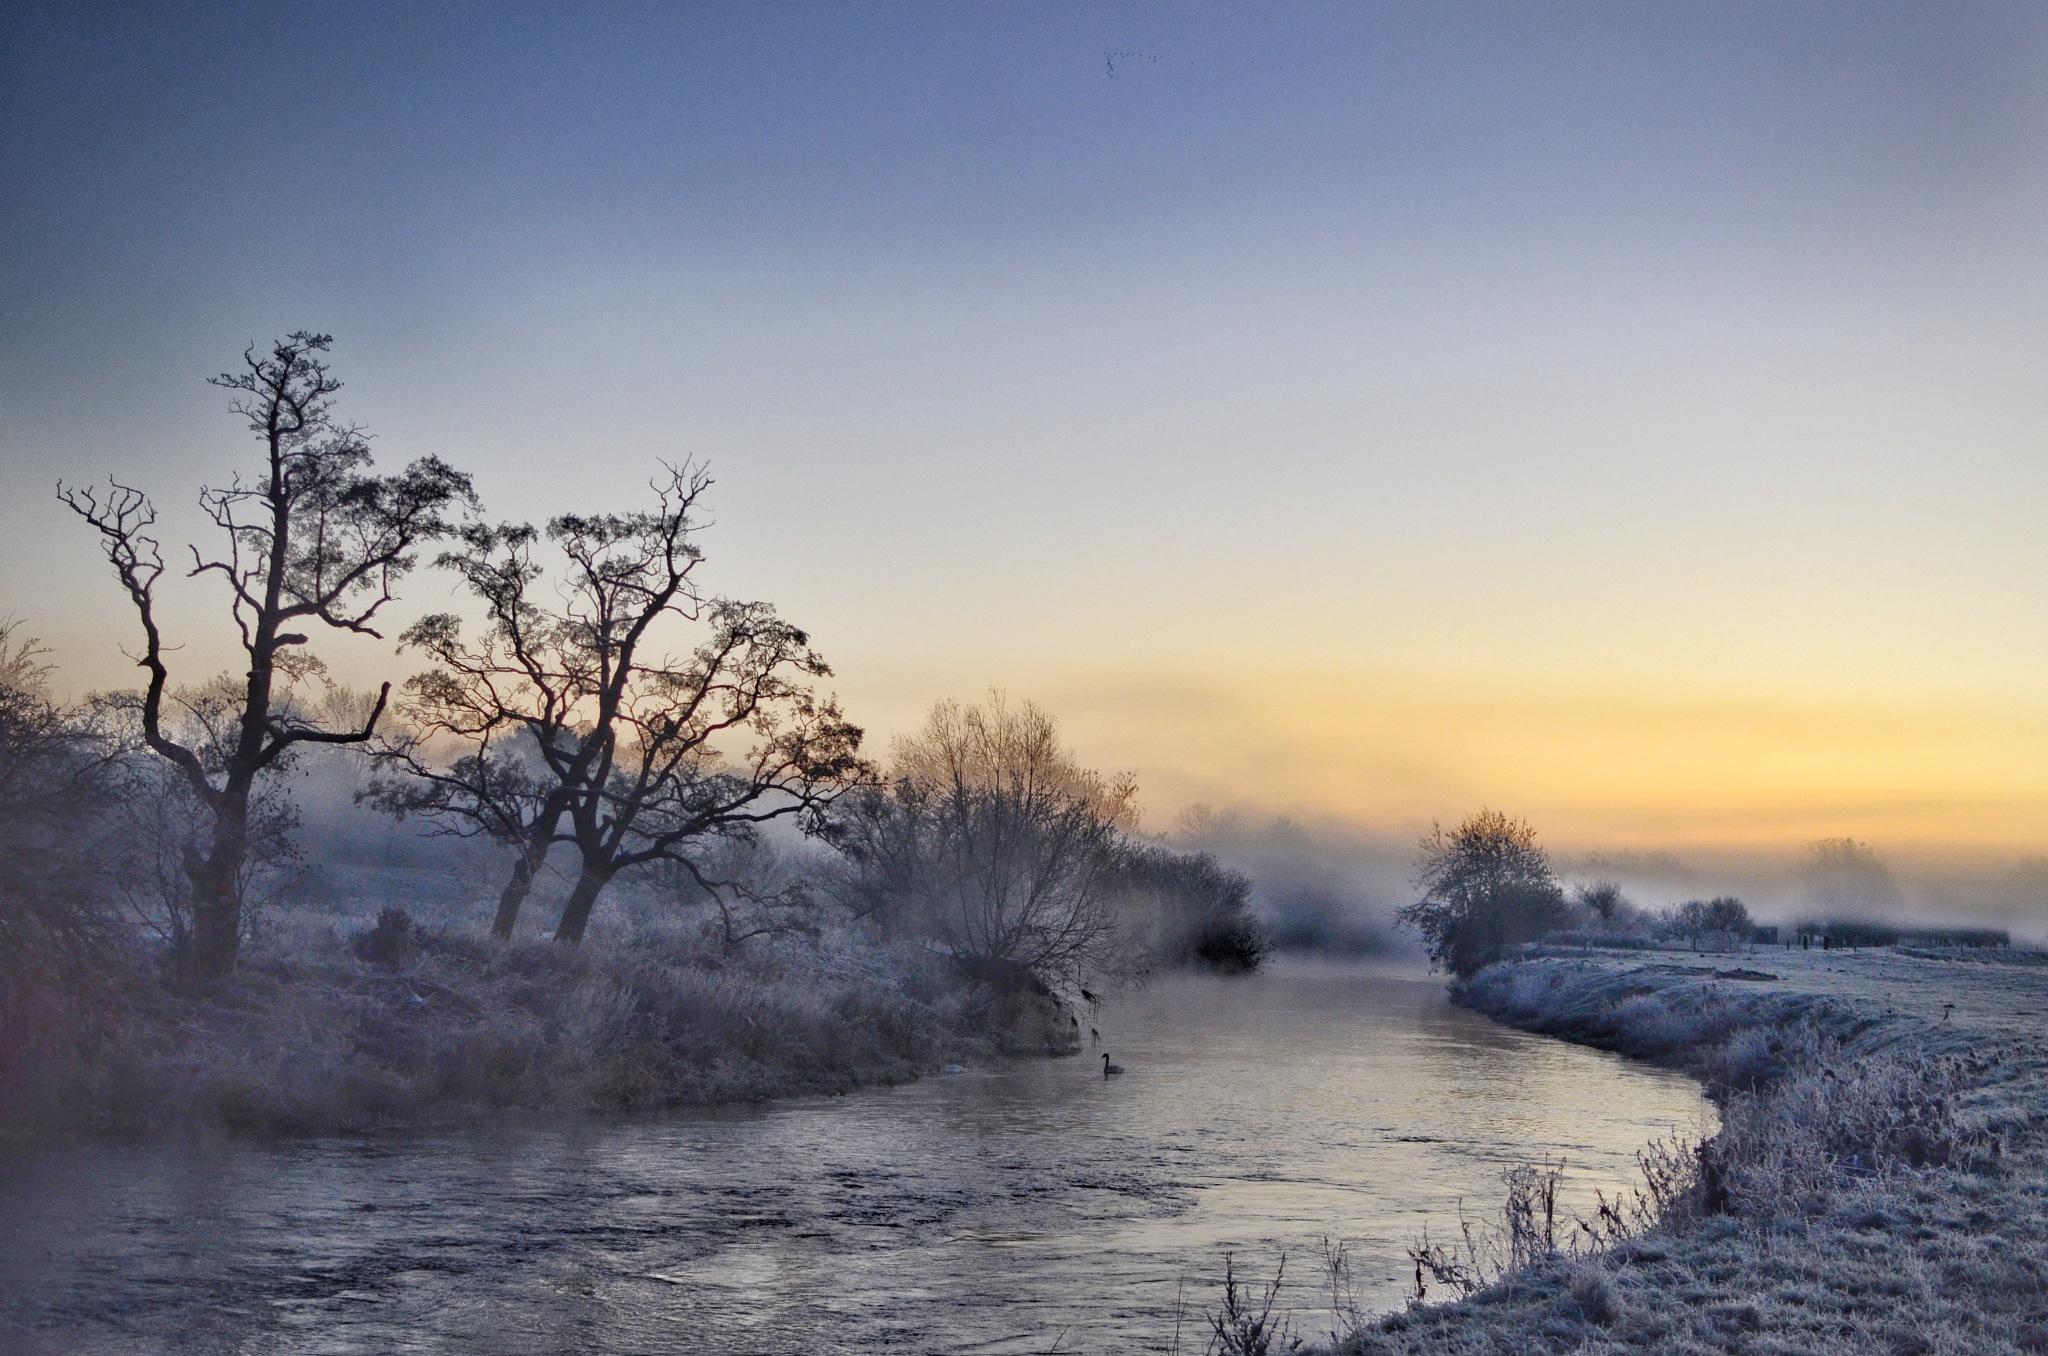 frosty morning by Nicholas Sharpe